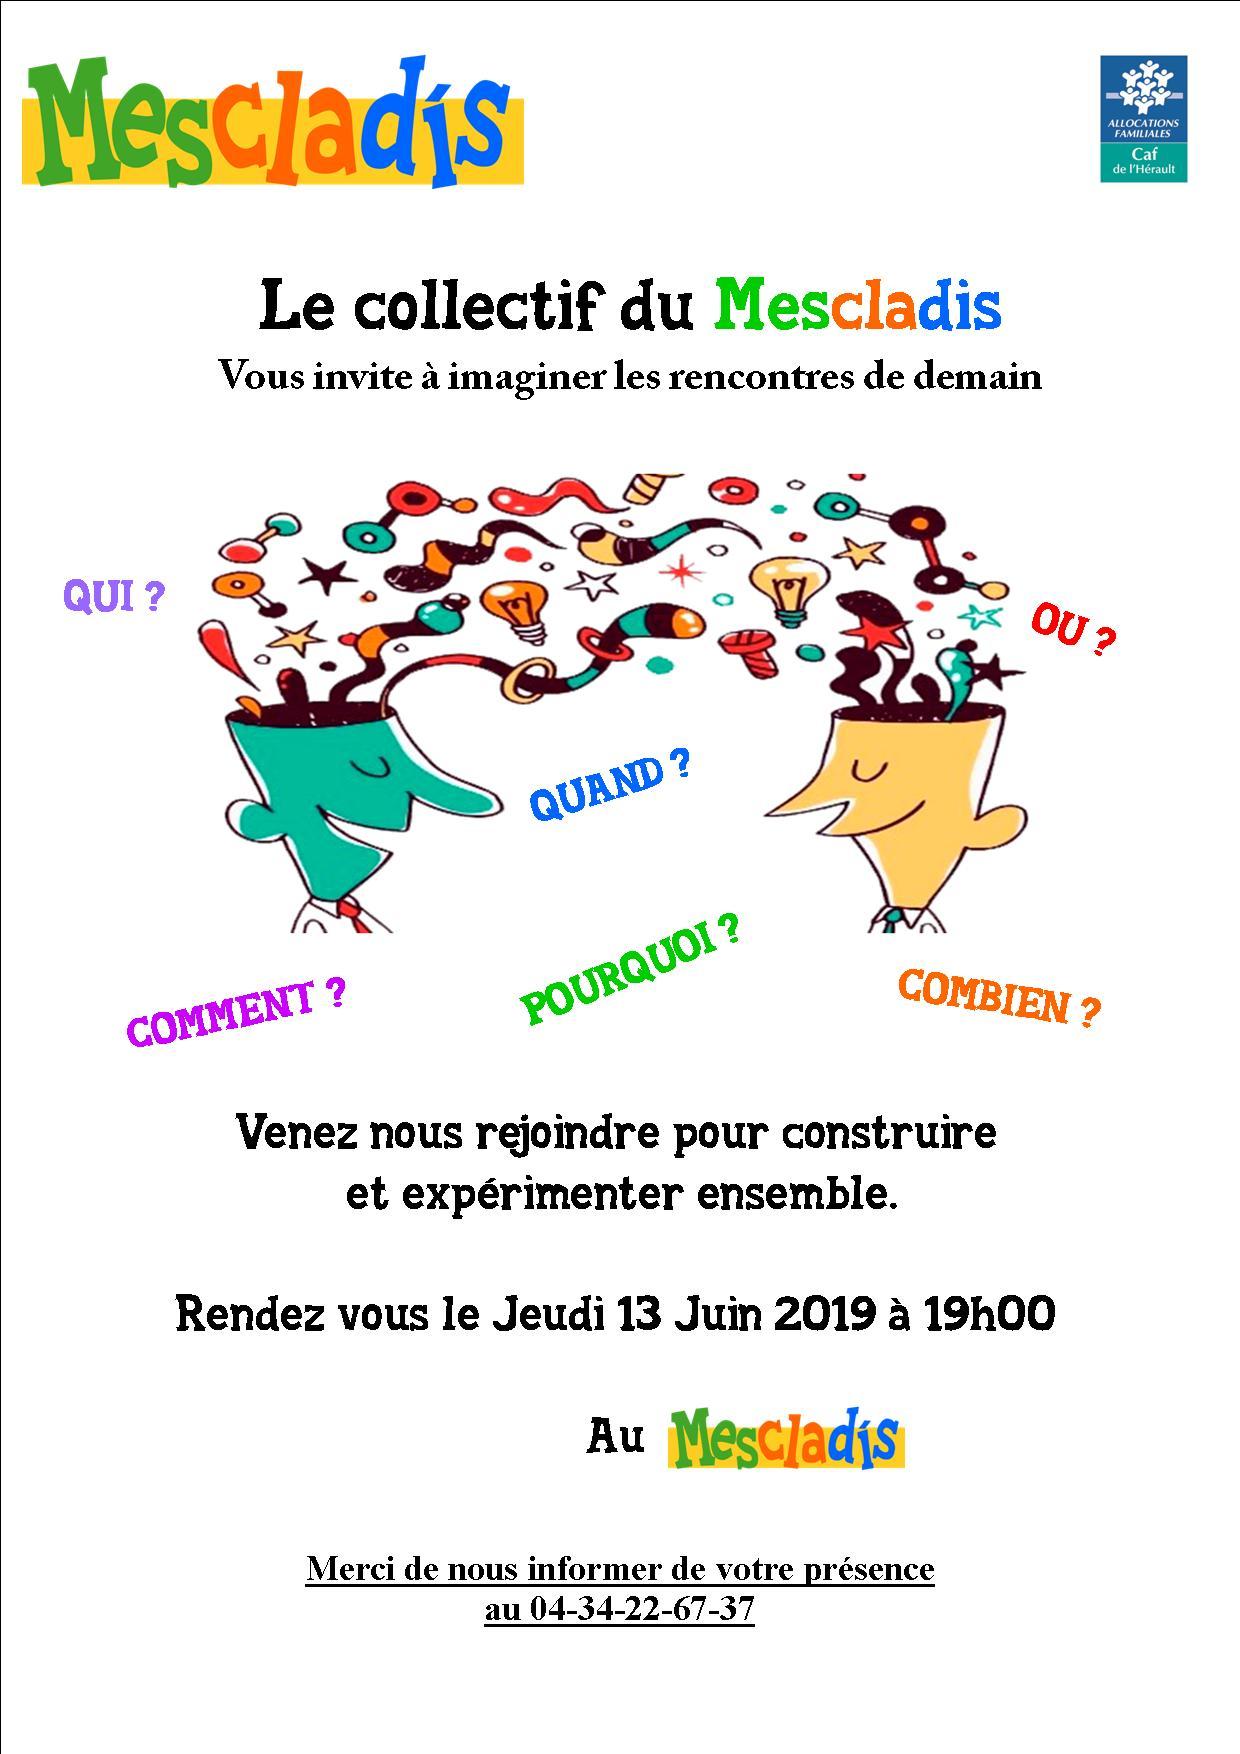 Le collectif du Mescladis